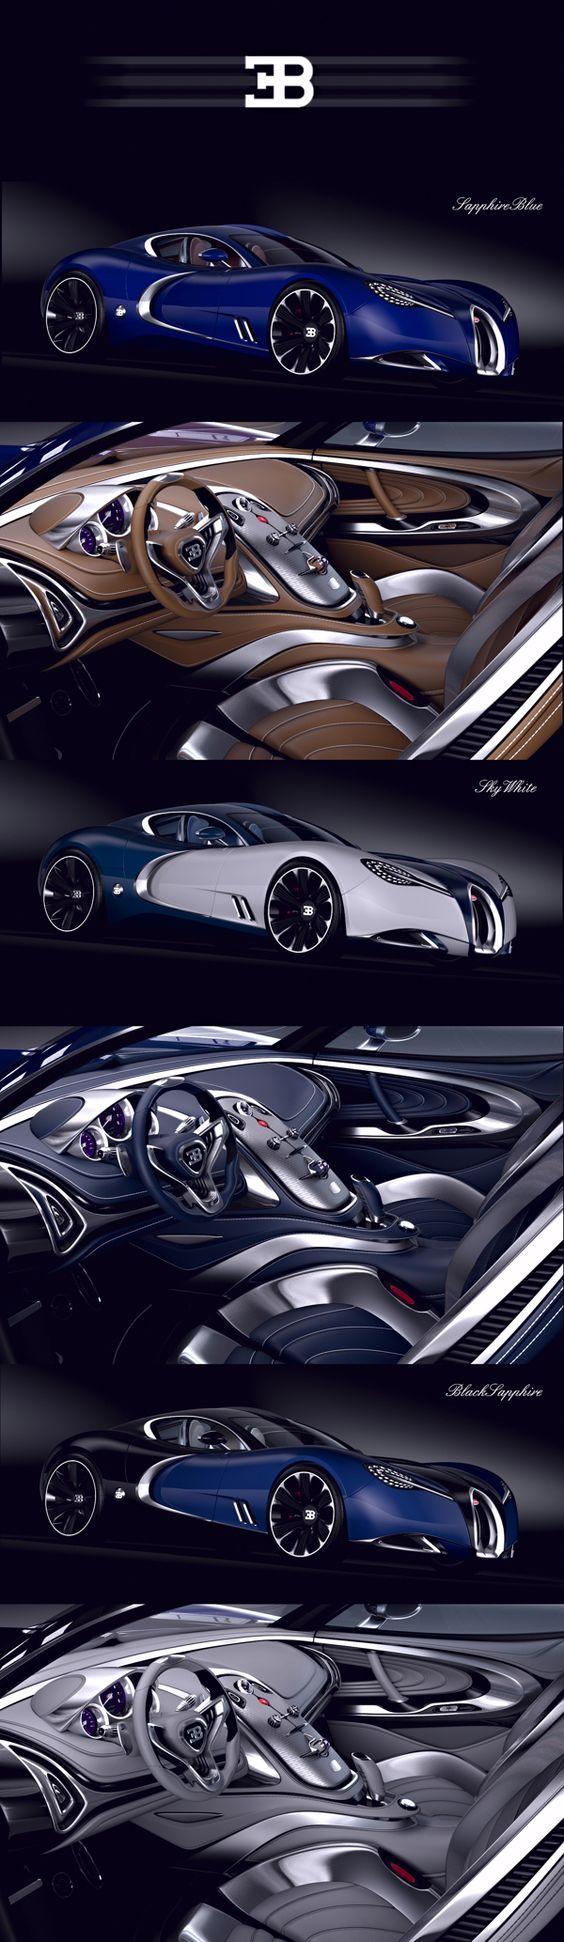 bugatti gangloff concept luxury car lifestyle. Black Bedroom Furniture Sets. Home Design Ideas